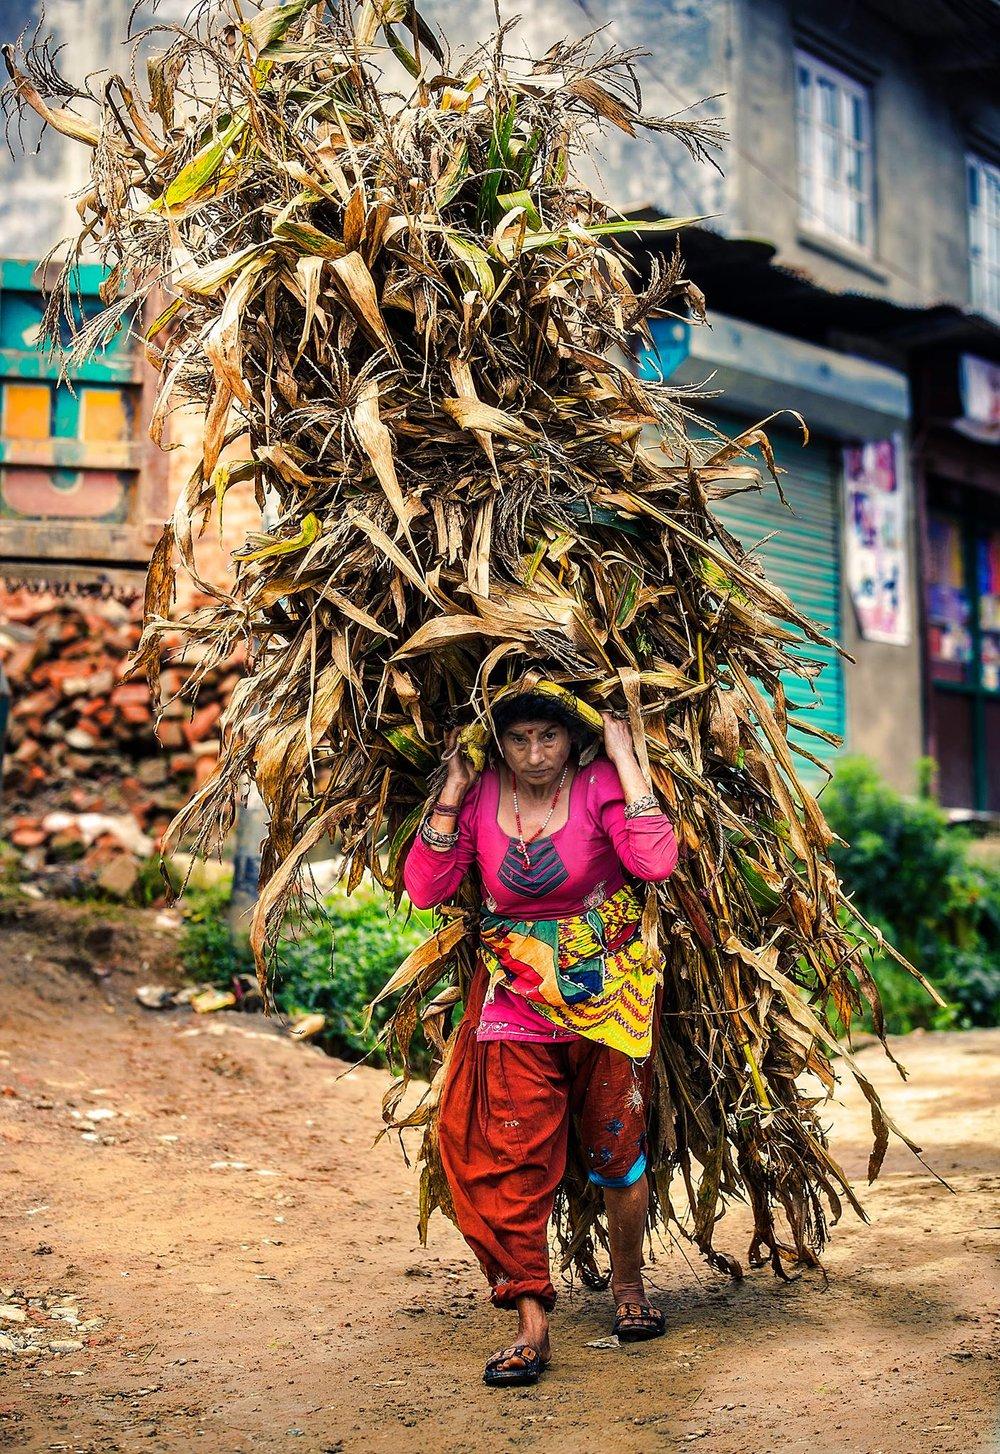 Simon+Needham+Humanitarian+Photography+Nepal+6.jpg